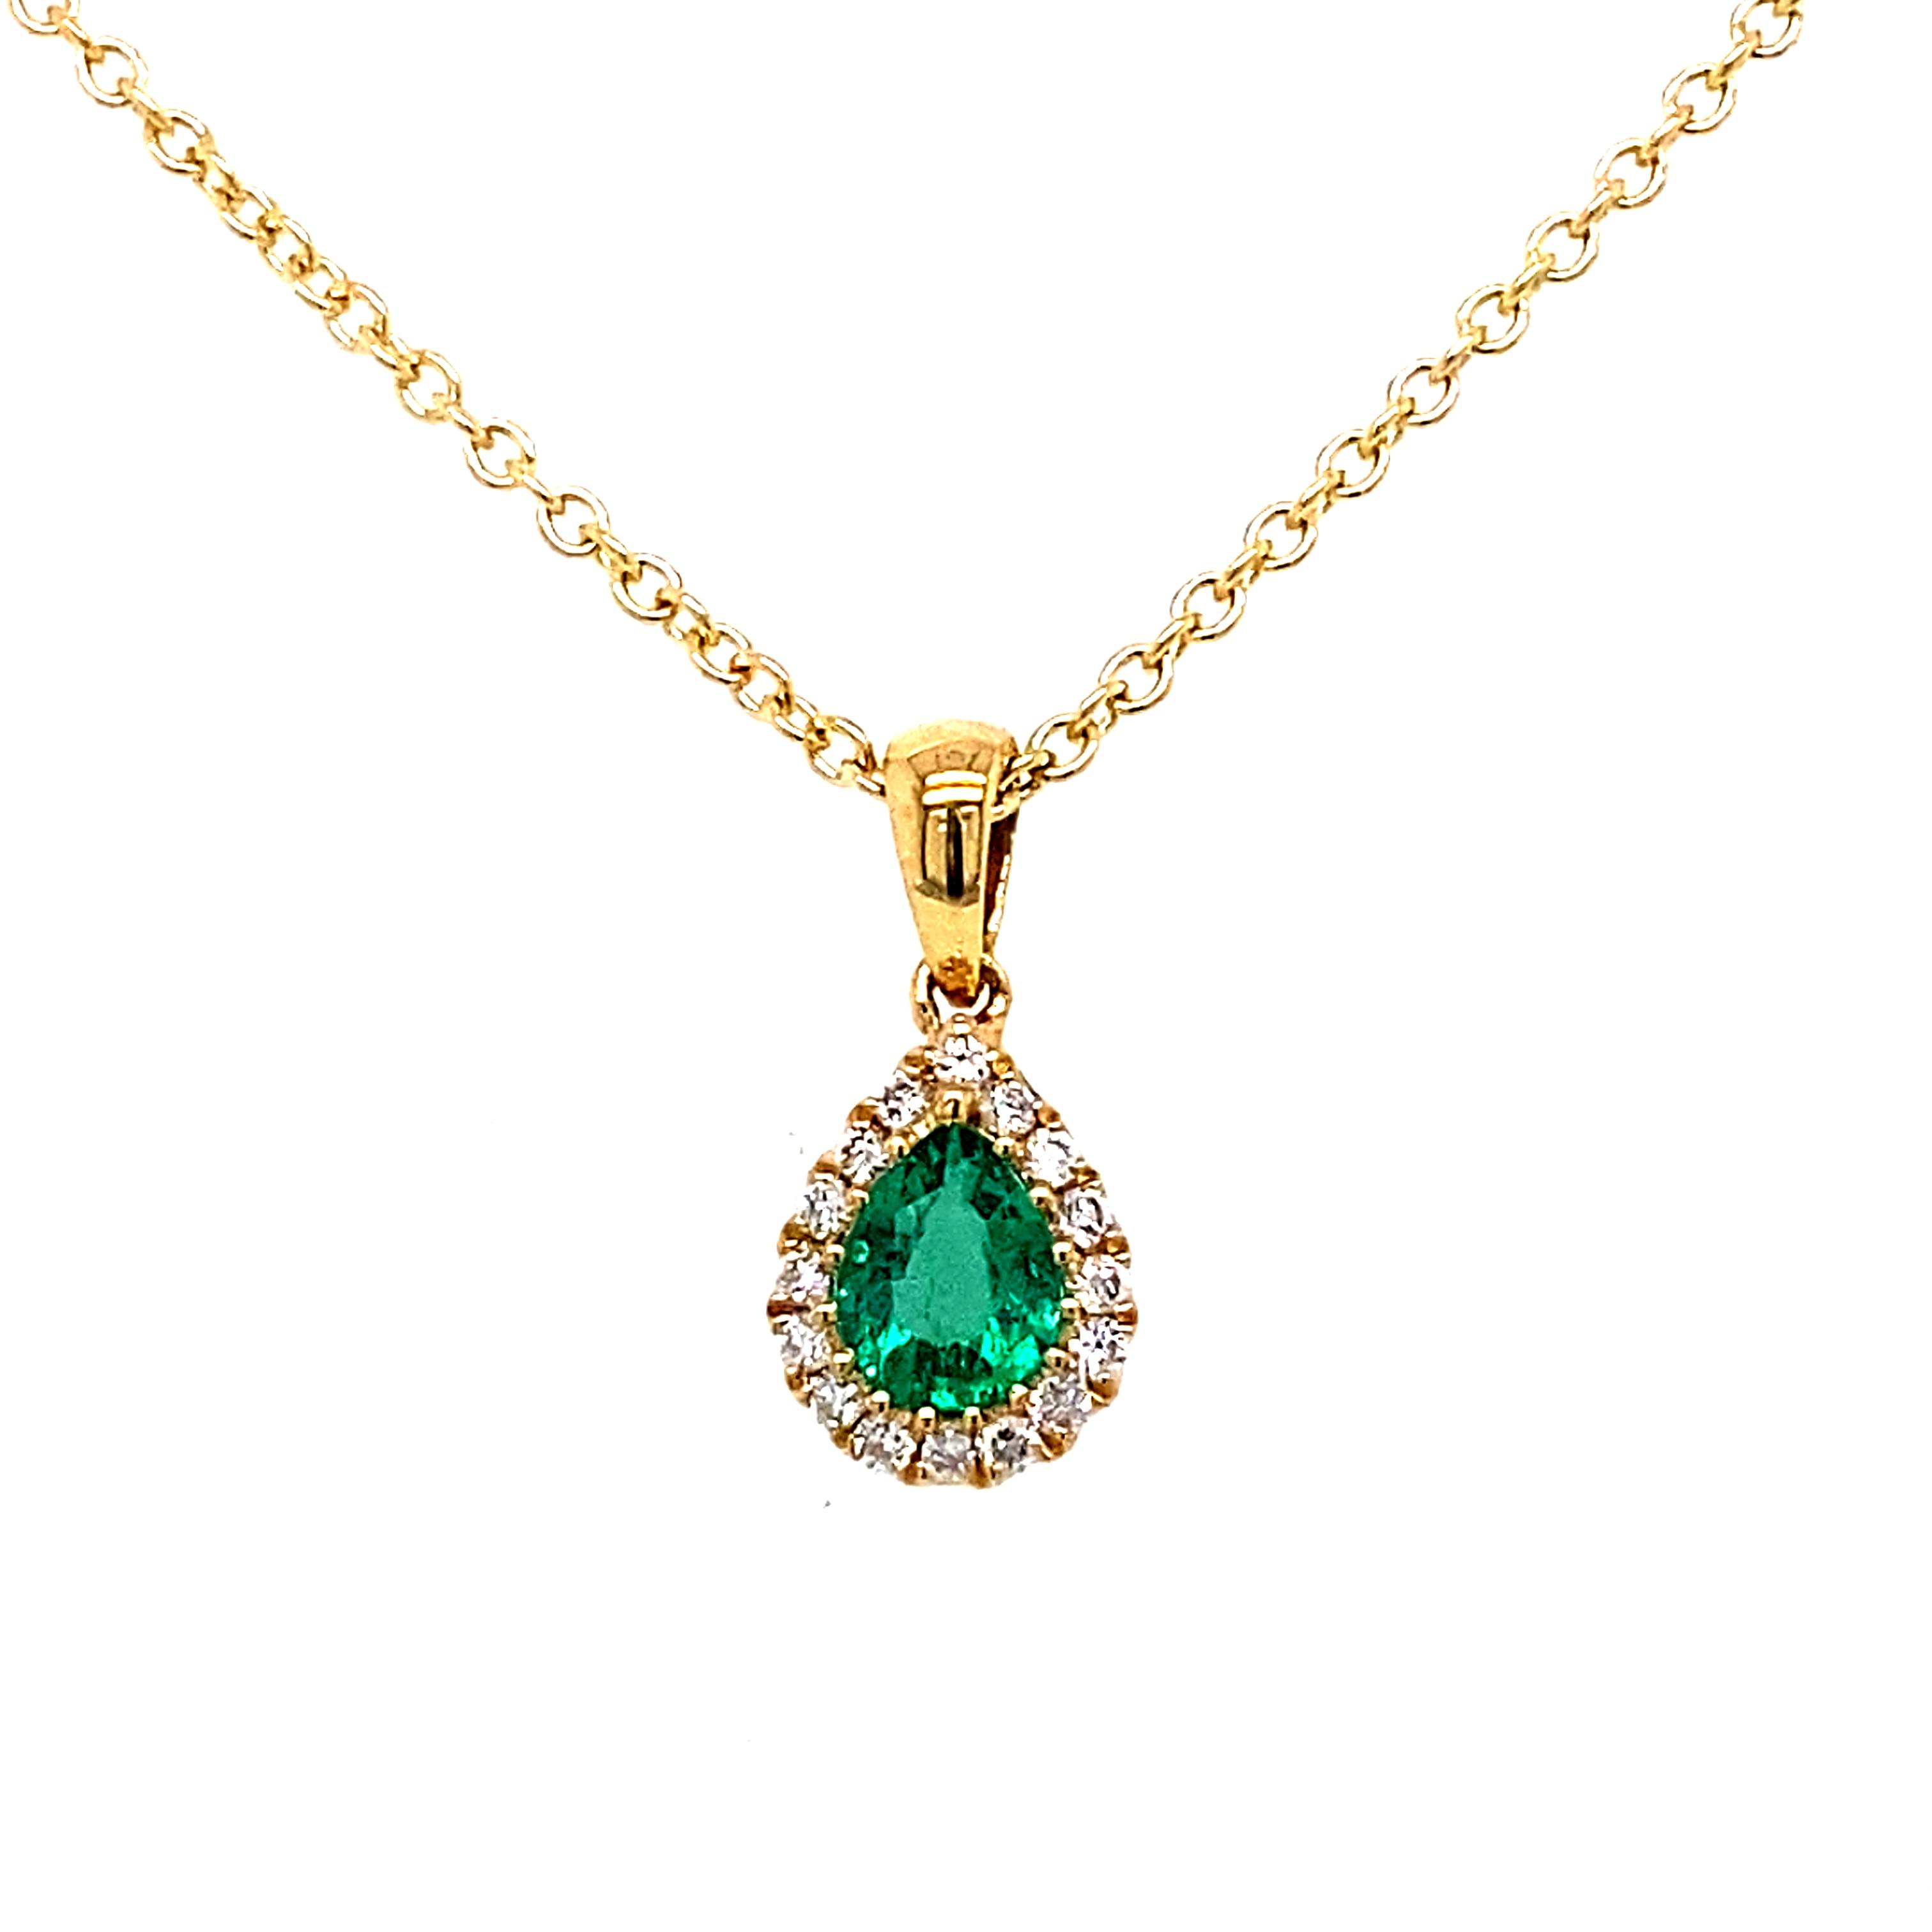 18 Carat Yellow Gold, Emerald and Diamond Pendant